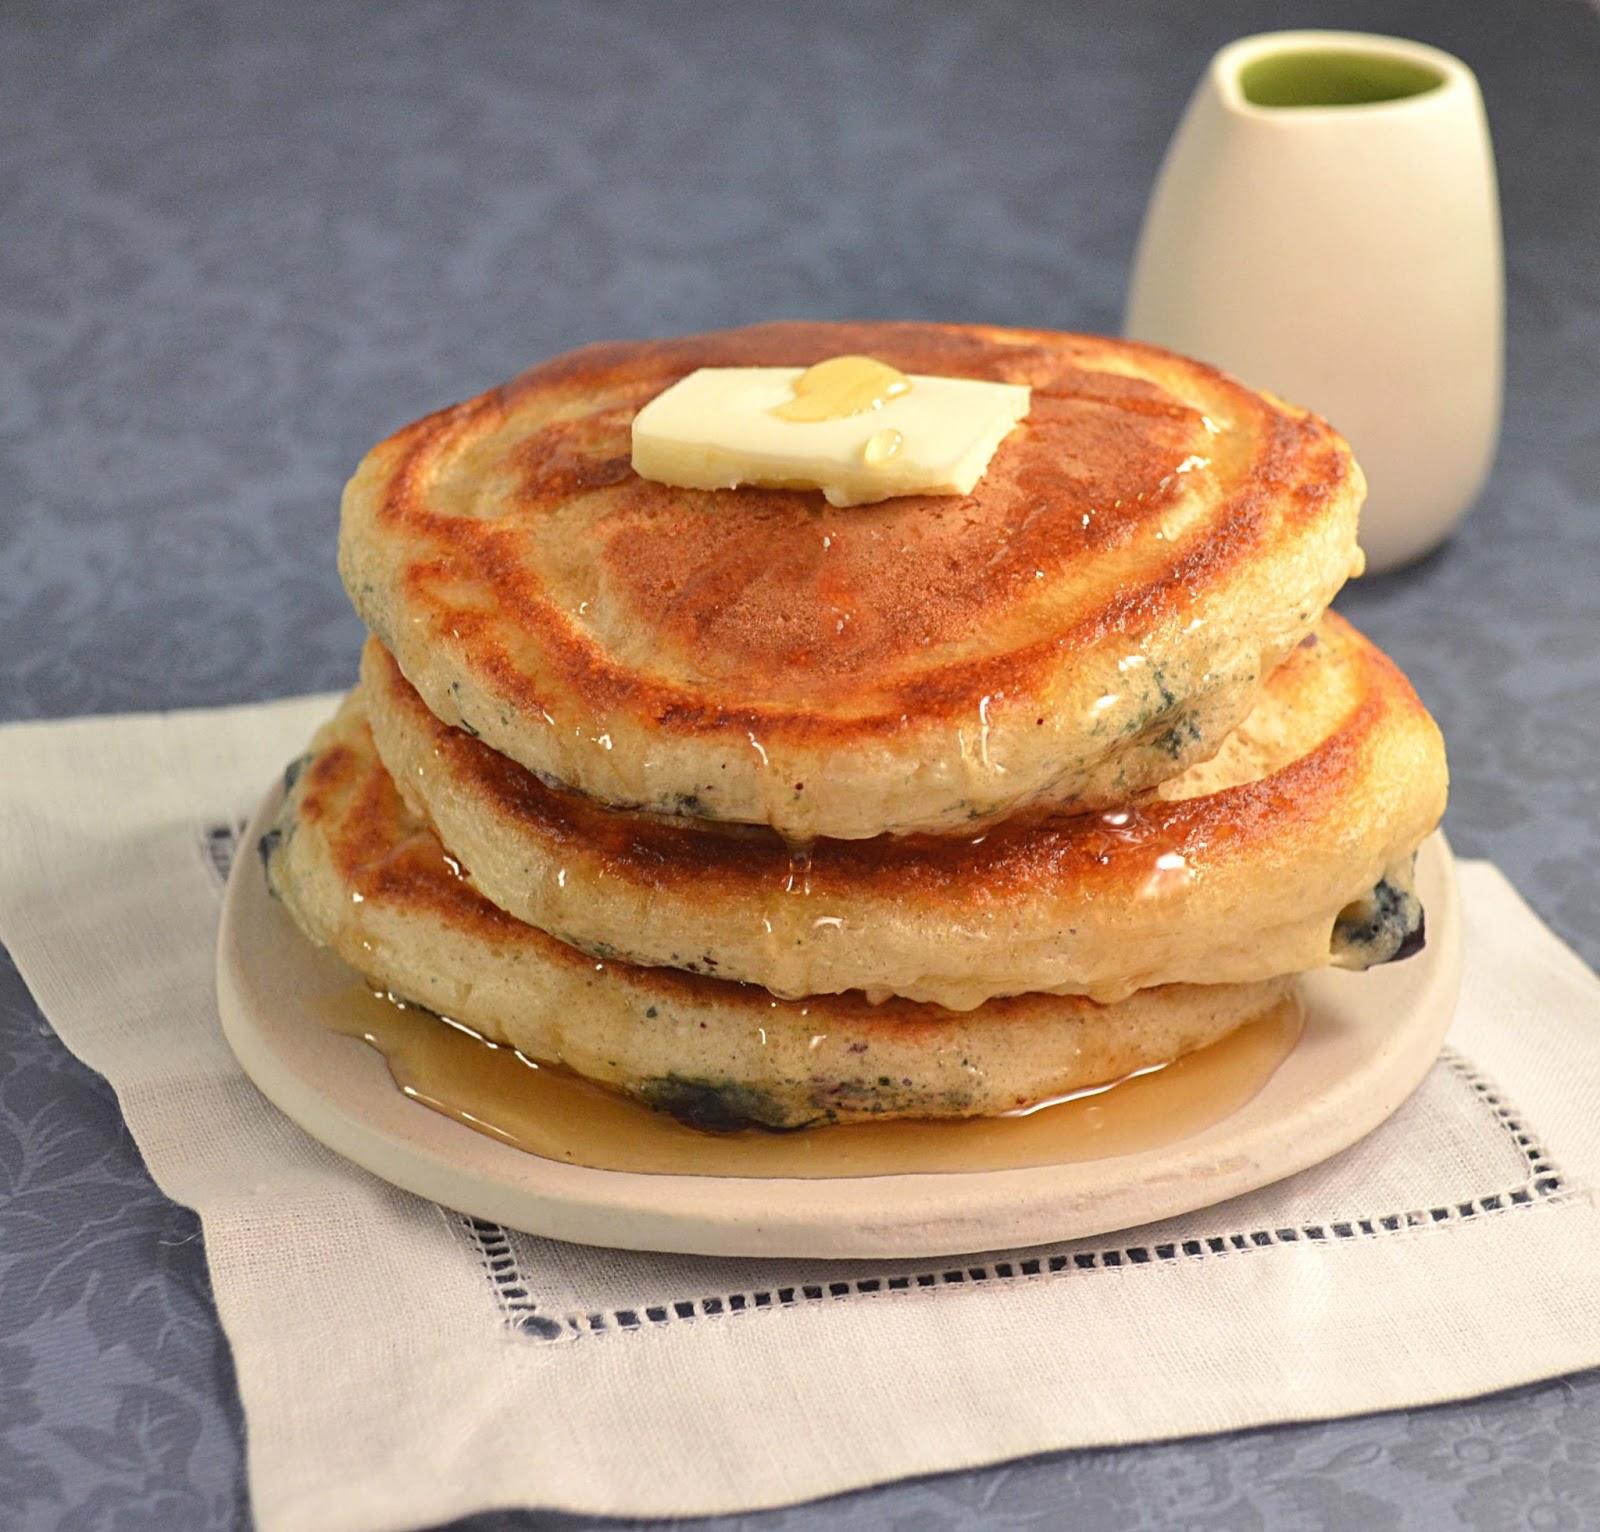 Jilly...Inspired : Scrumptious Church Cookbook Pancakes